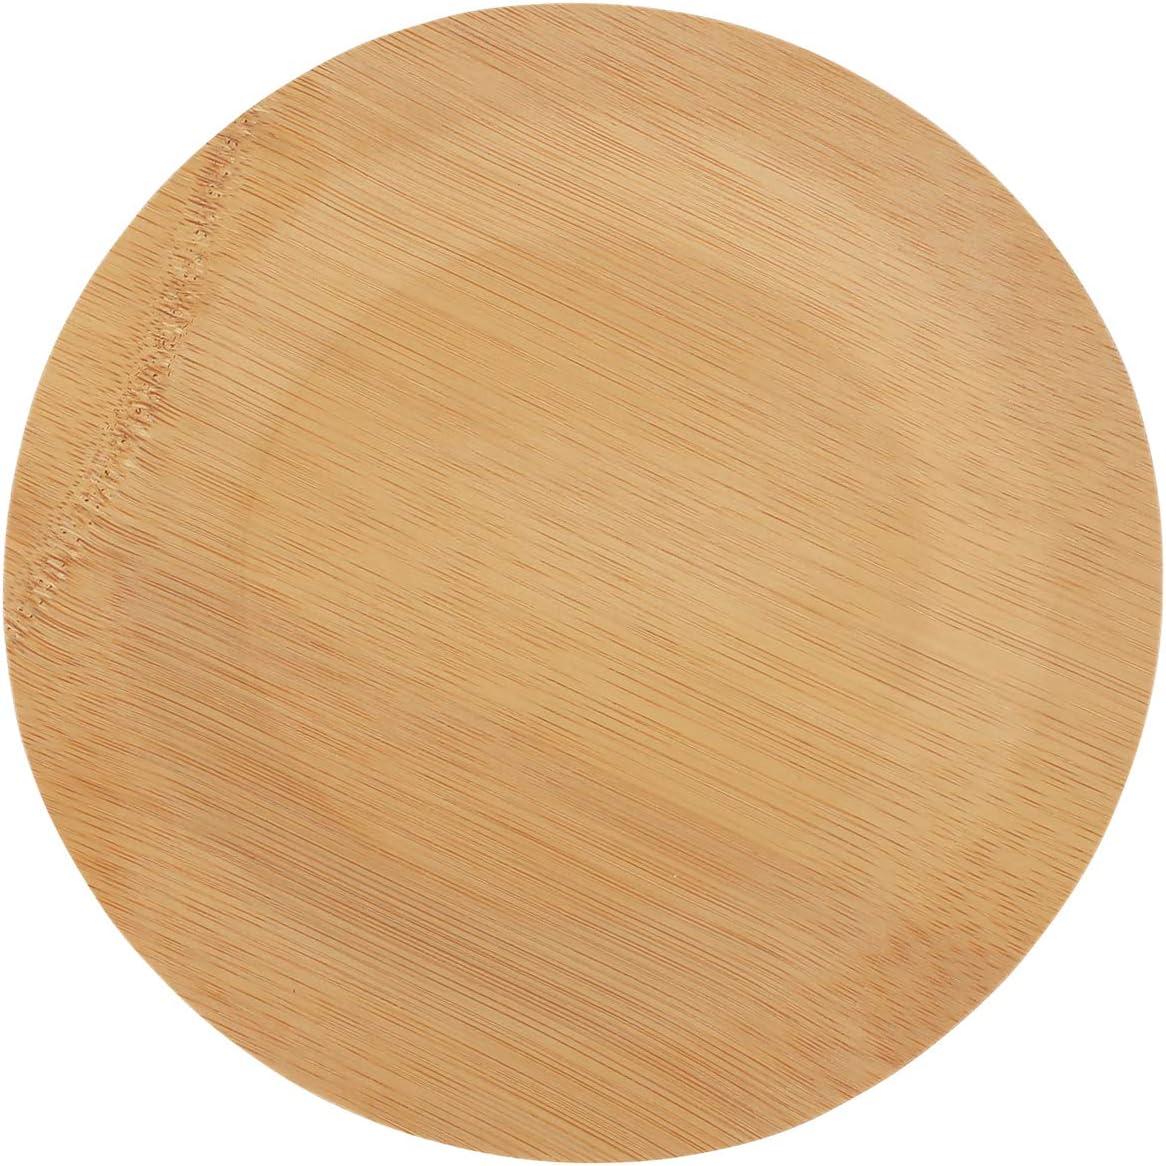 "Brheez 新品■送料無料■ 7"" Bamboo Veneer Disposable Eco-Friendly Plates Elegant - 捧呈"